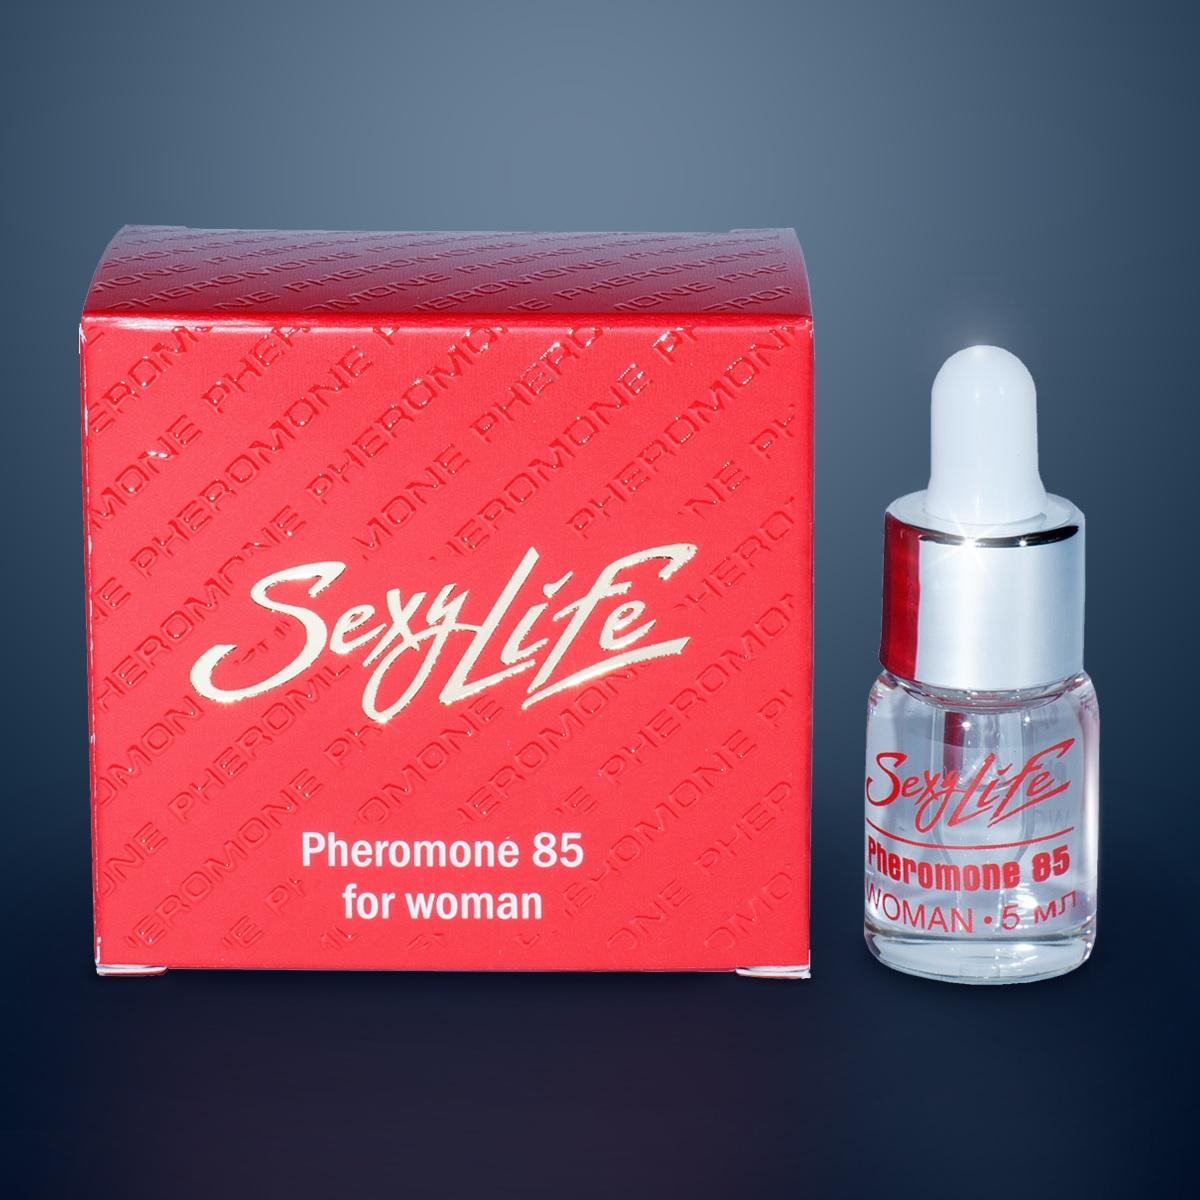 Фото Концентрат феромонов Sexy Life для женщин (концентрация 85%) - 5 мл.